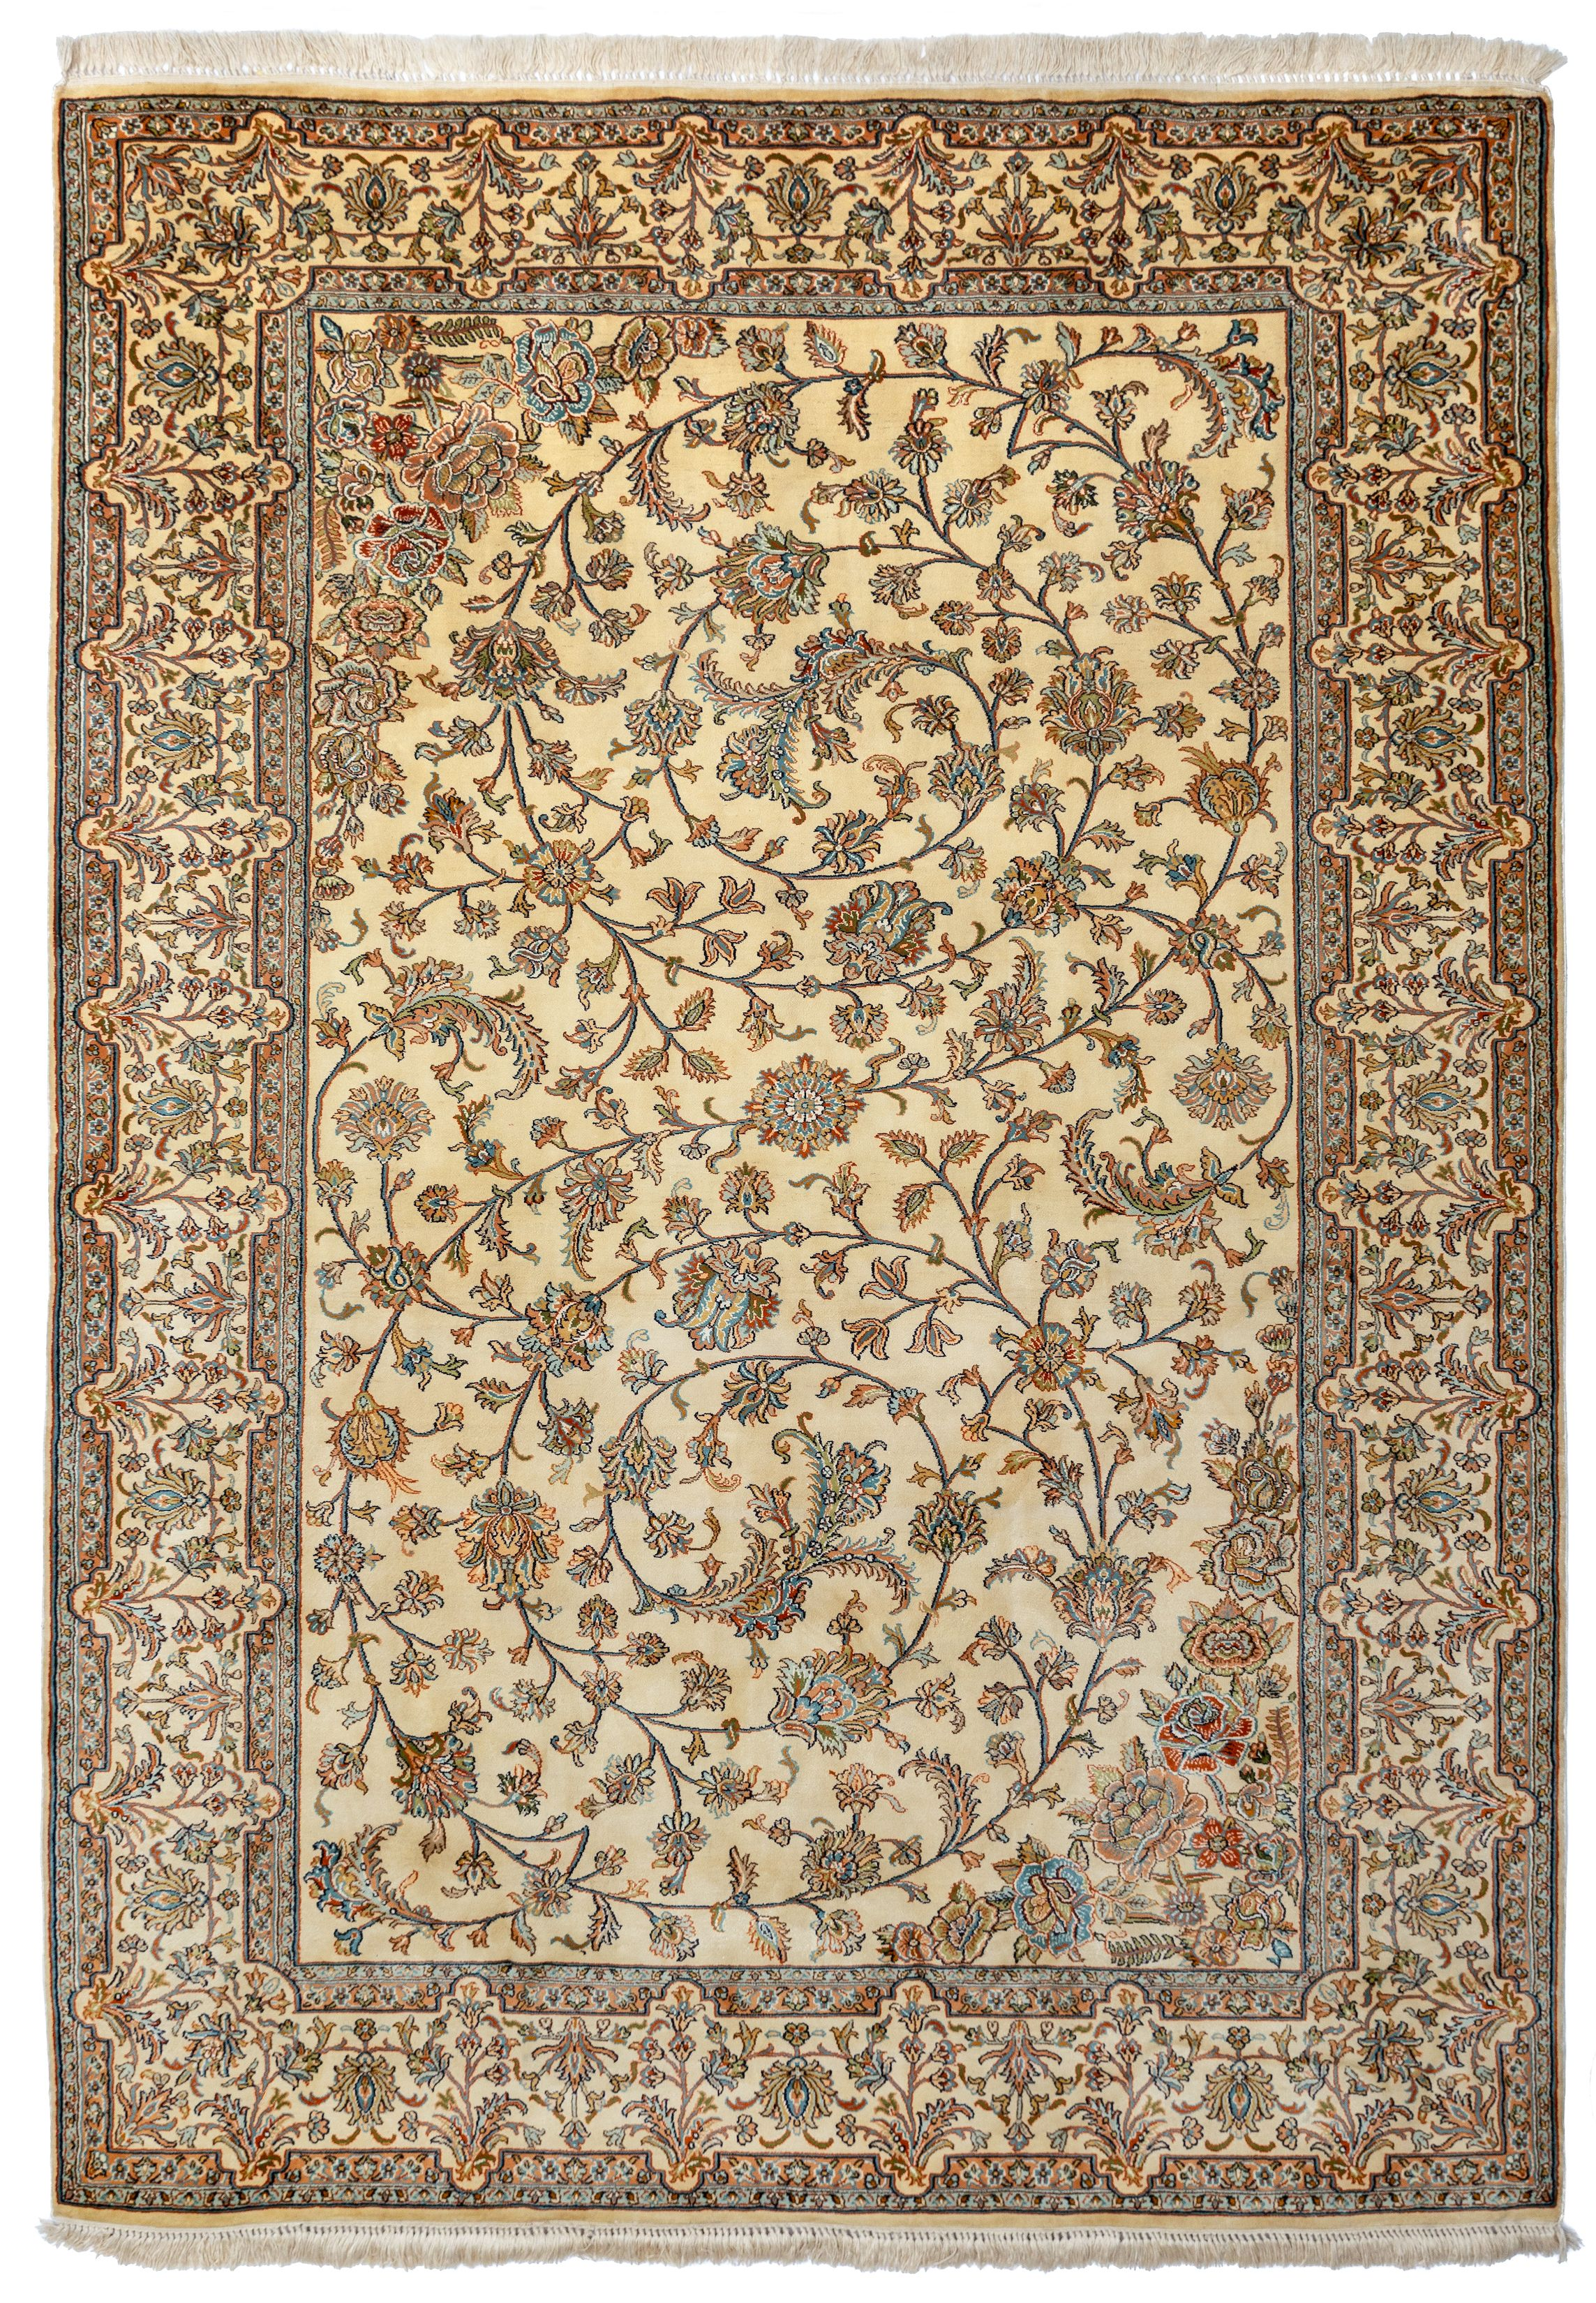 A Pure Kashmiri Silk Carpet With Unique All Over Scrolling Vine Design Silk Carpet Vine Design Old Art